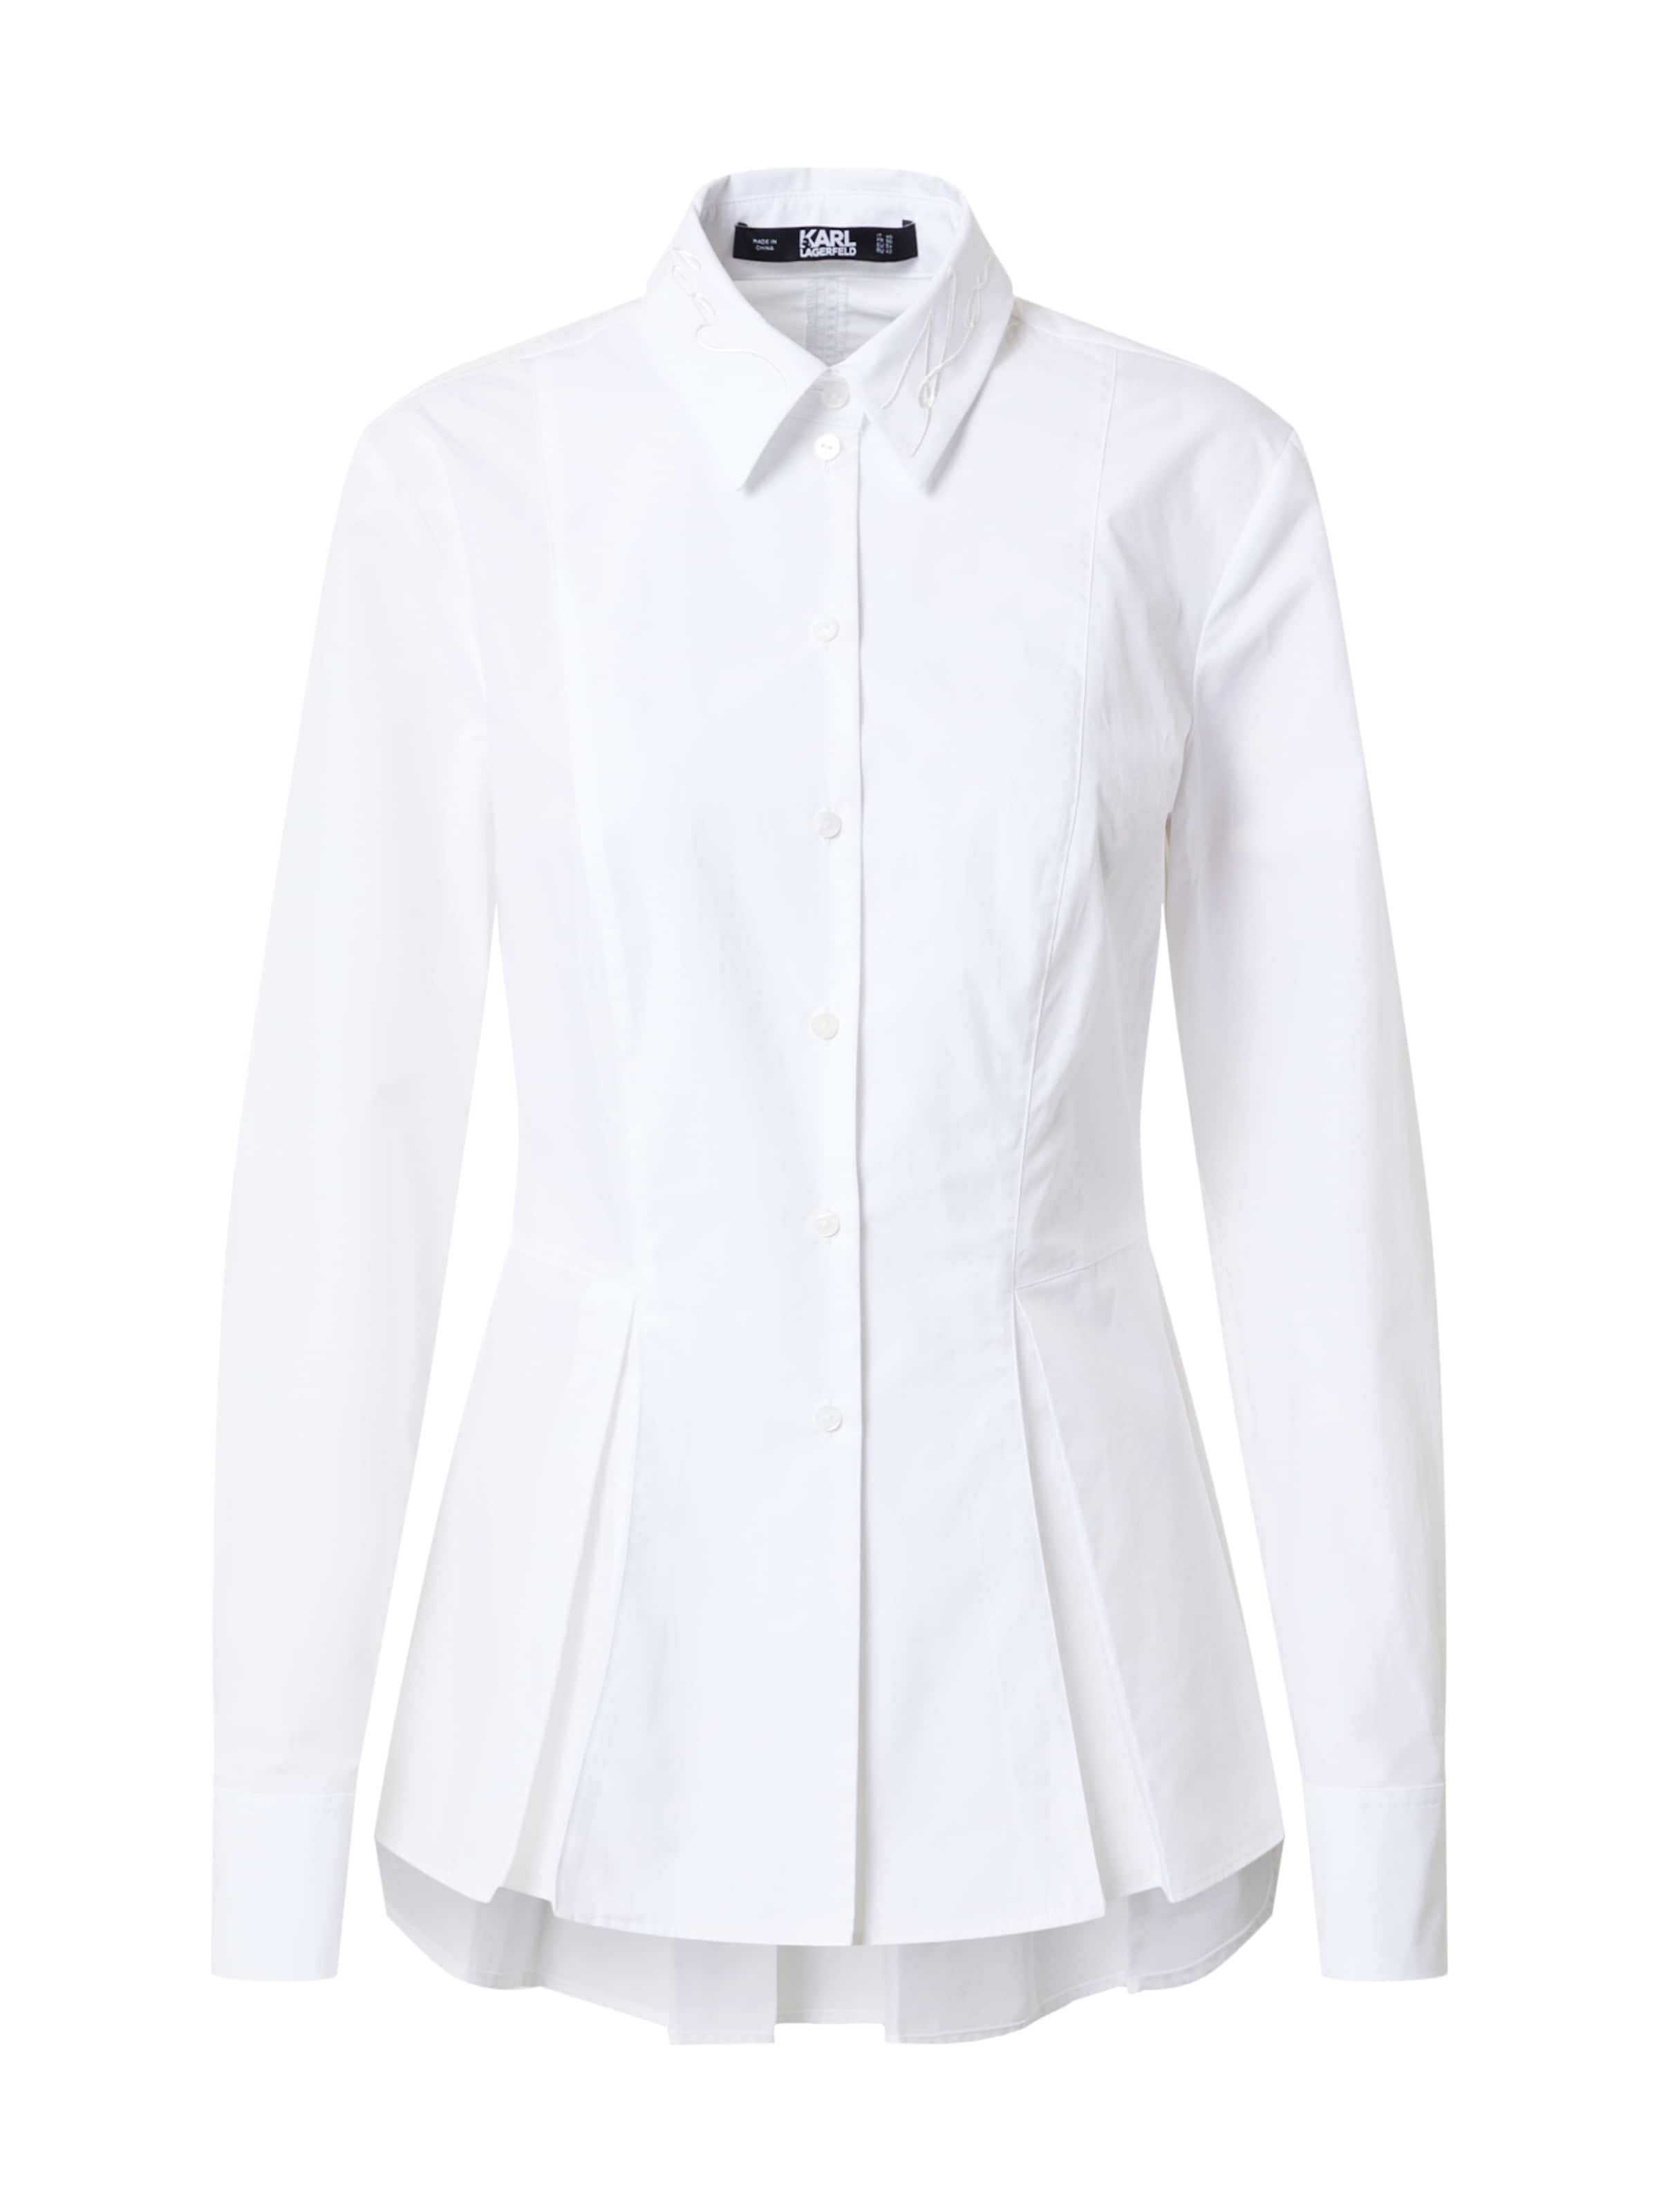 Karl Lagerfeld Bluse in weiß